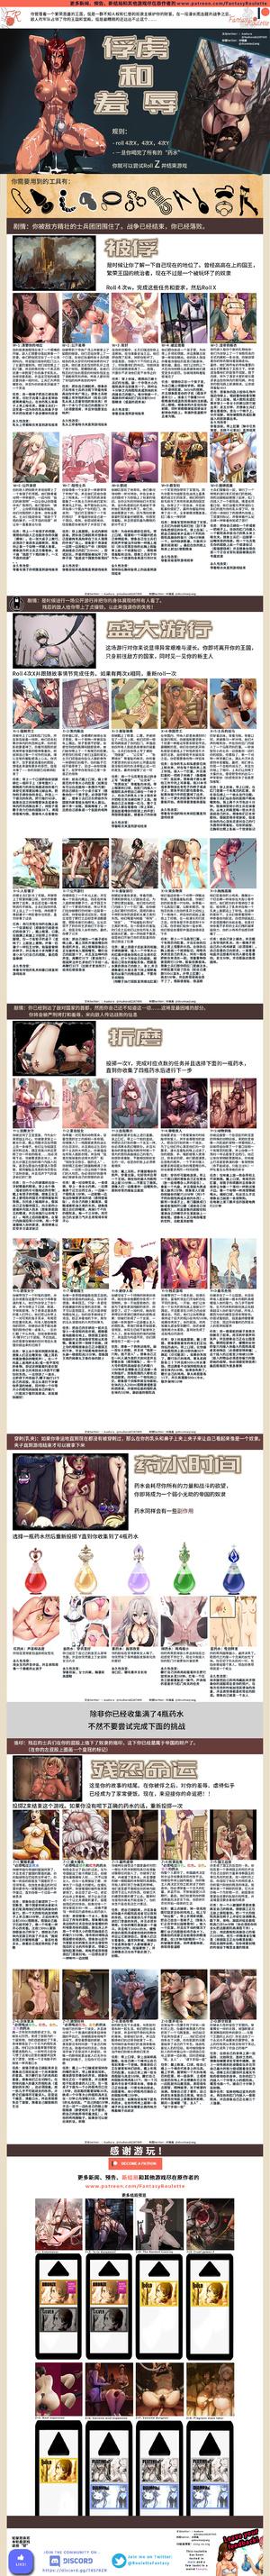 Captured & Humiliated (Chinese version)